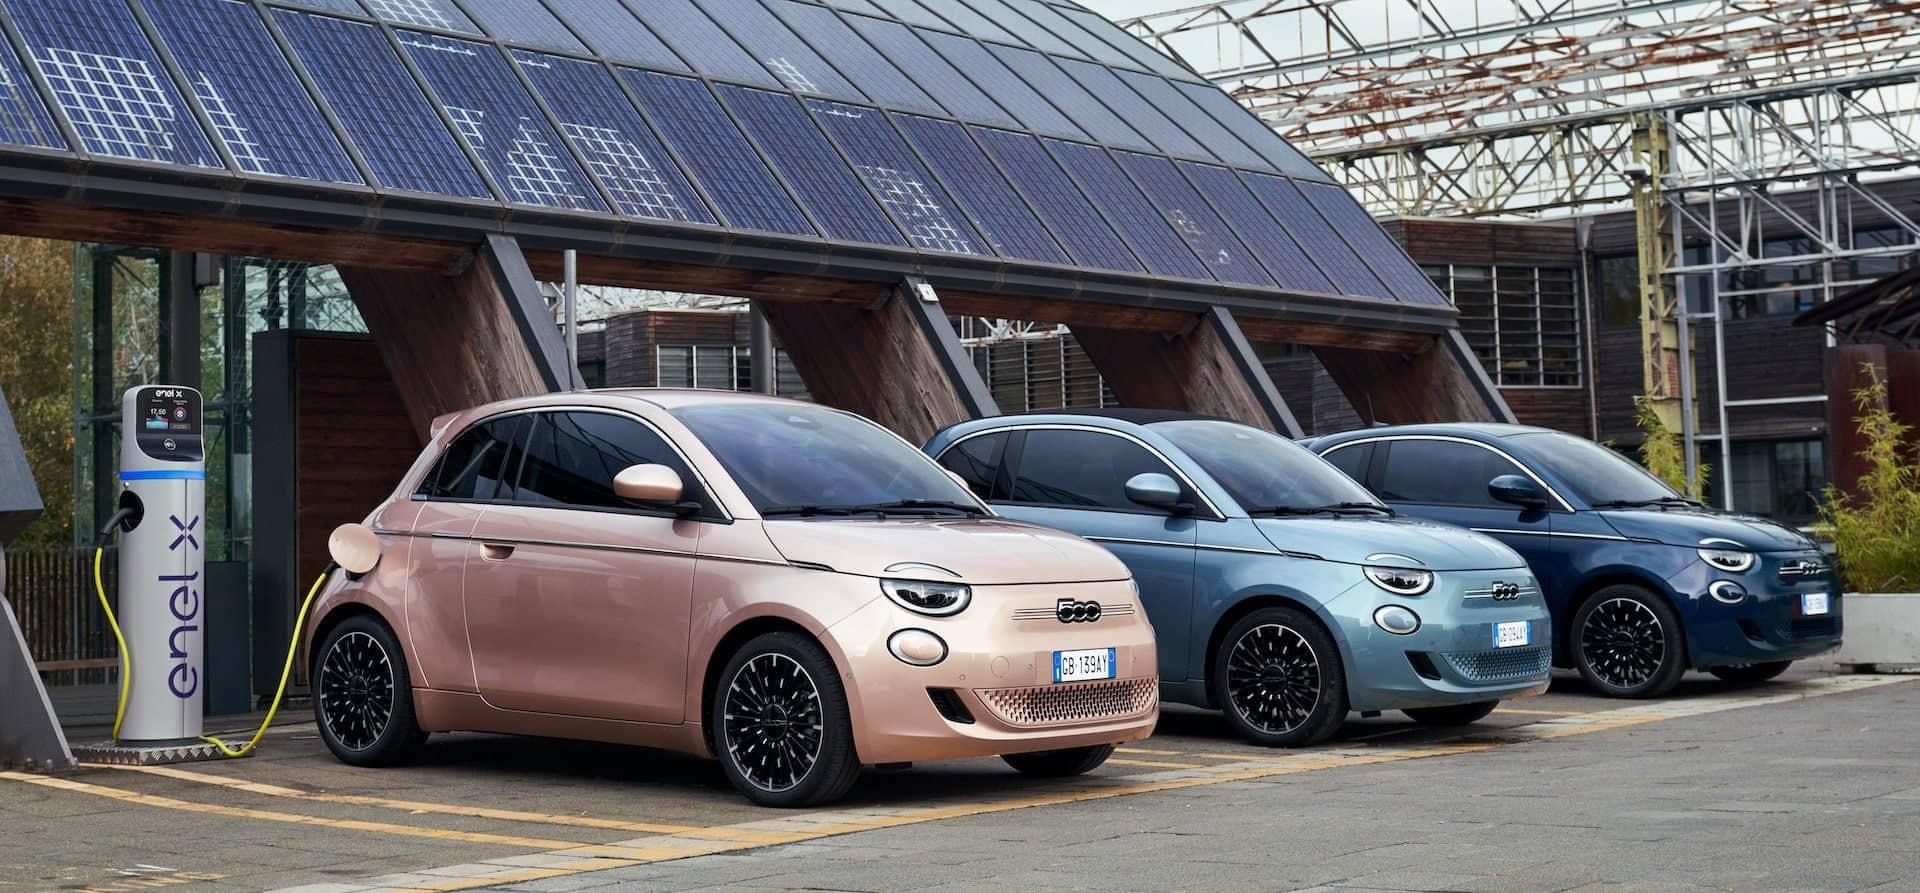 Fiat-500-Elektroauto-Varianten